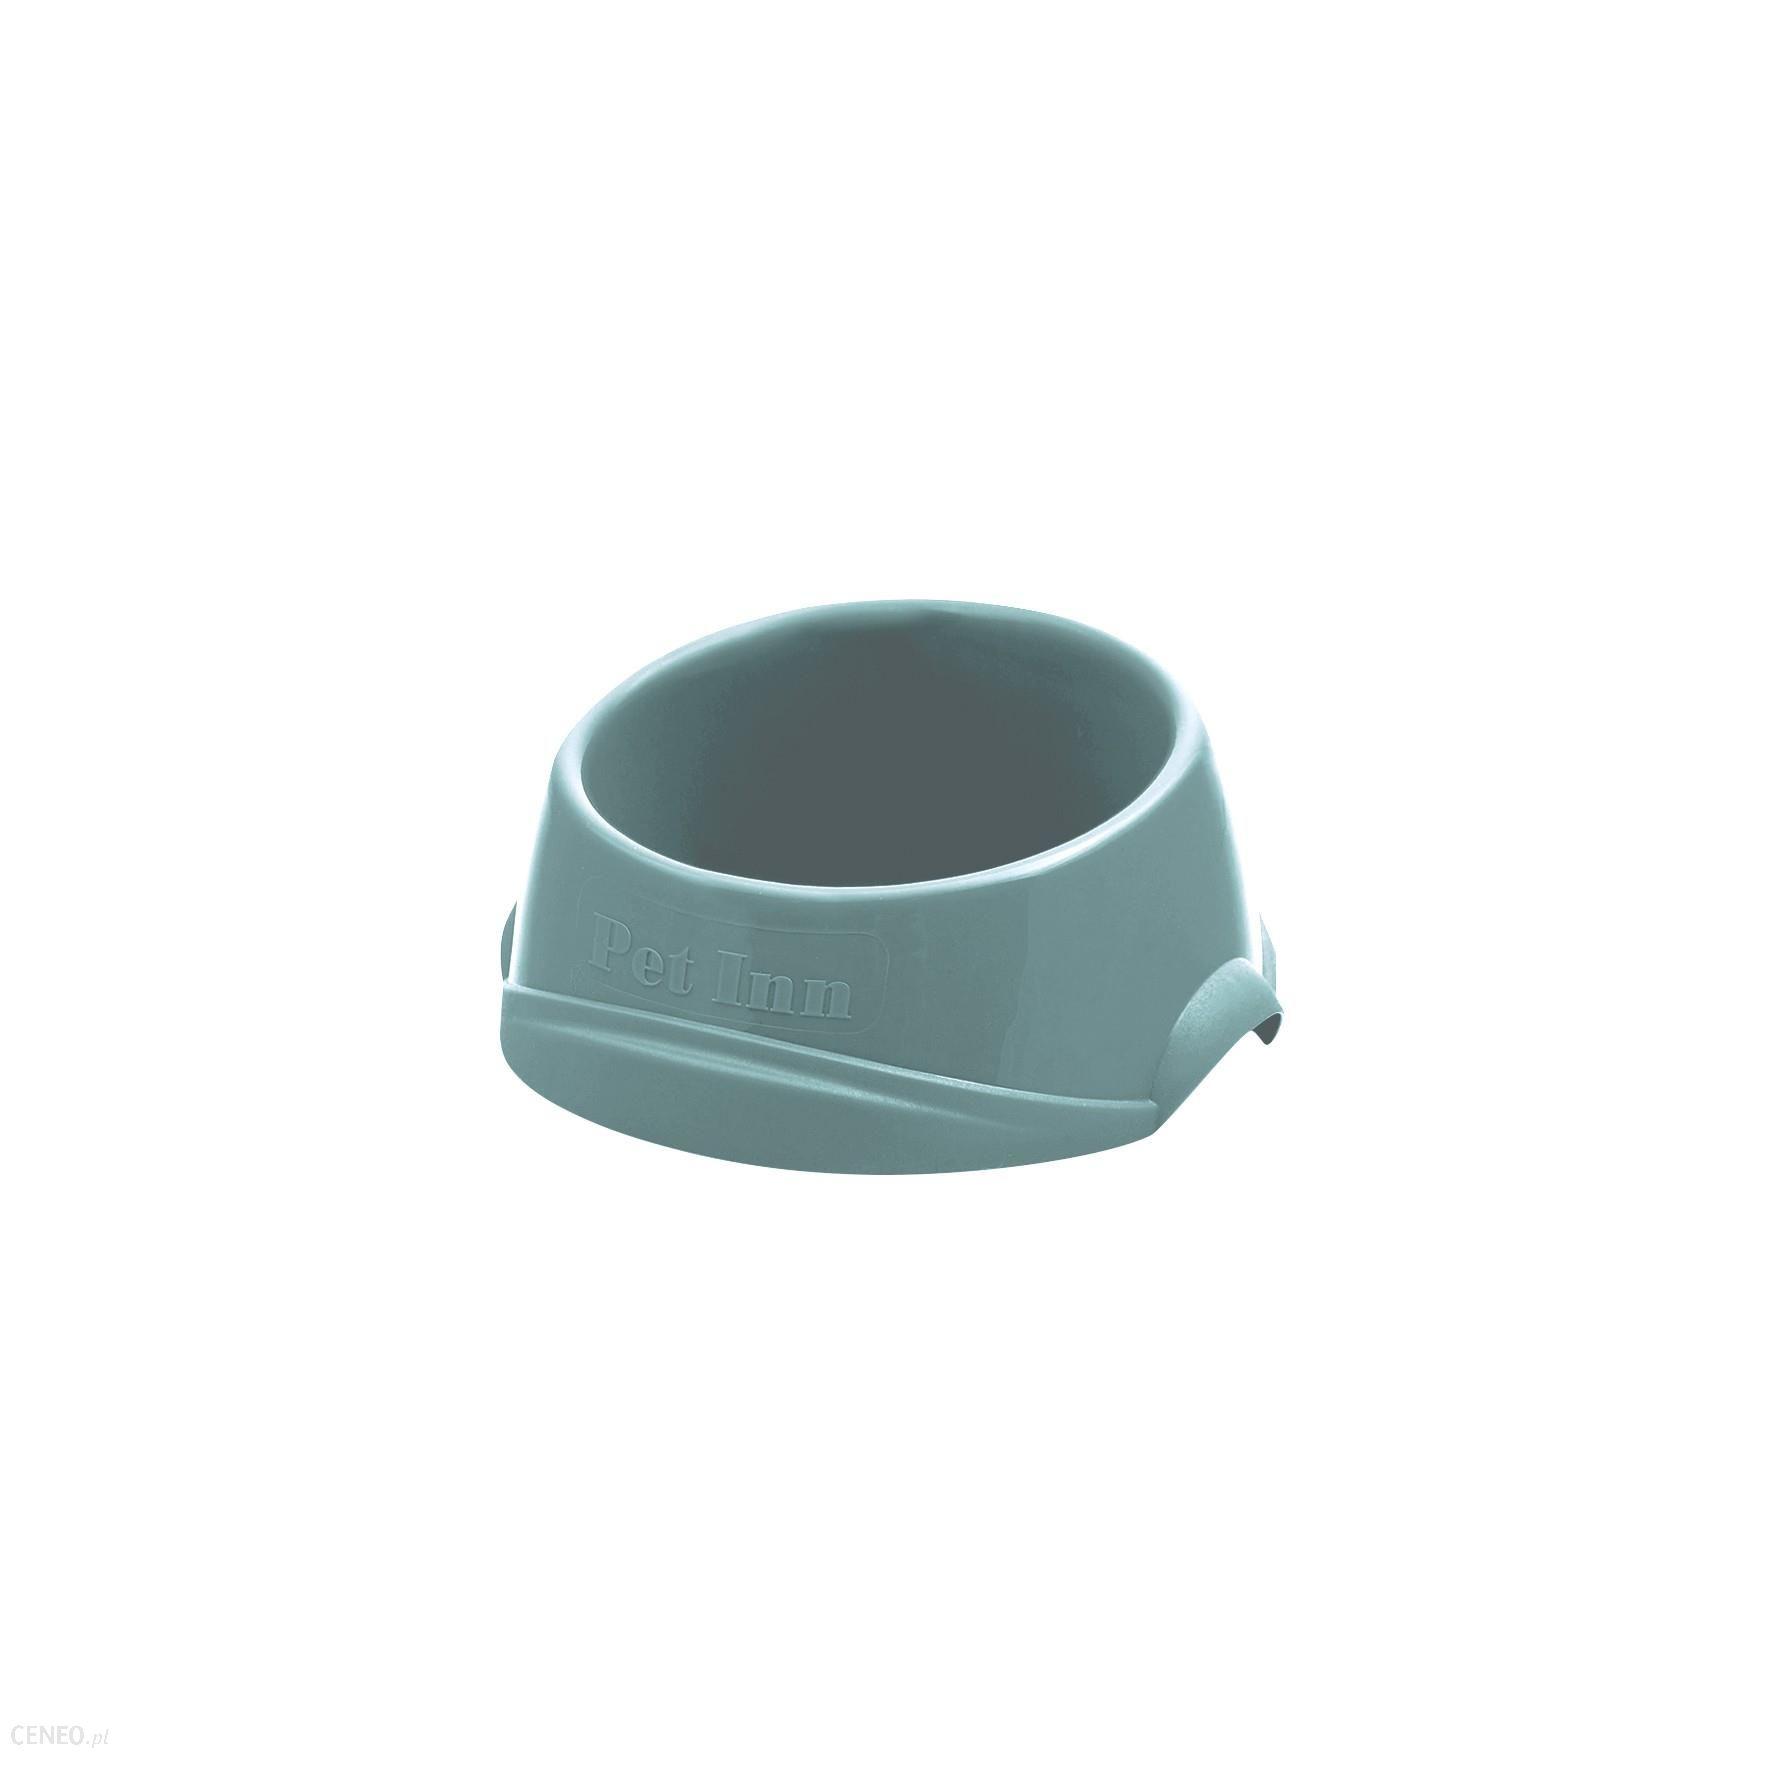 Comfy Miska Space Bowl Mięta 300Ml